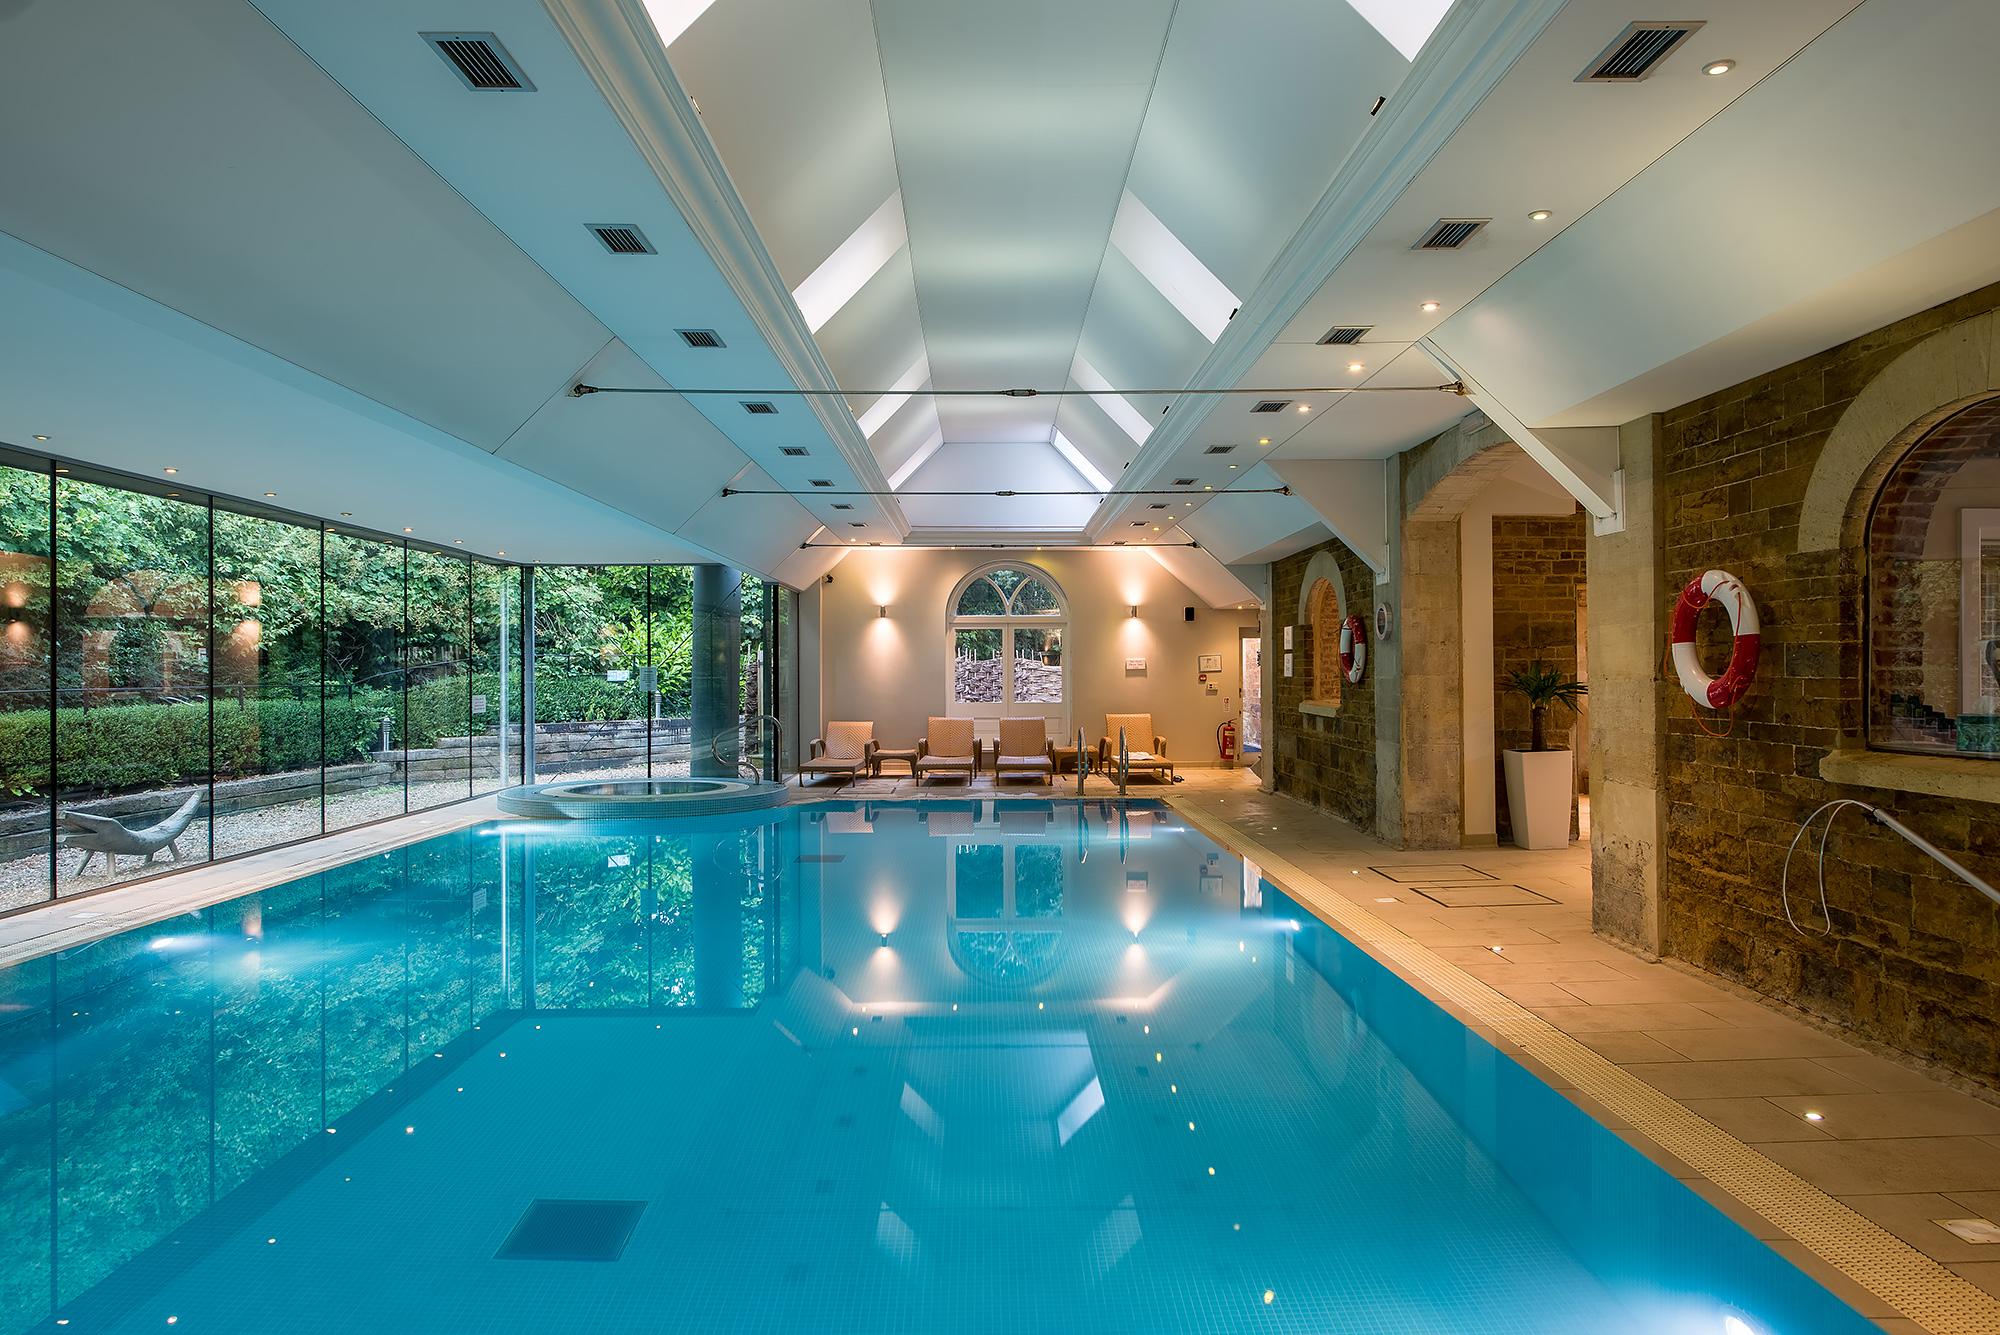 hotel-pool-photography.jpg